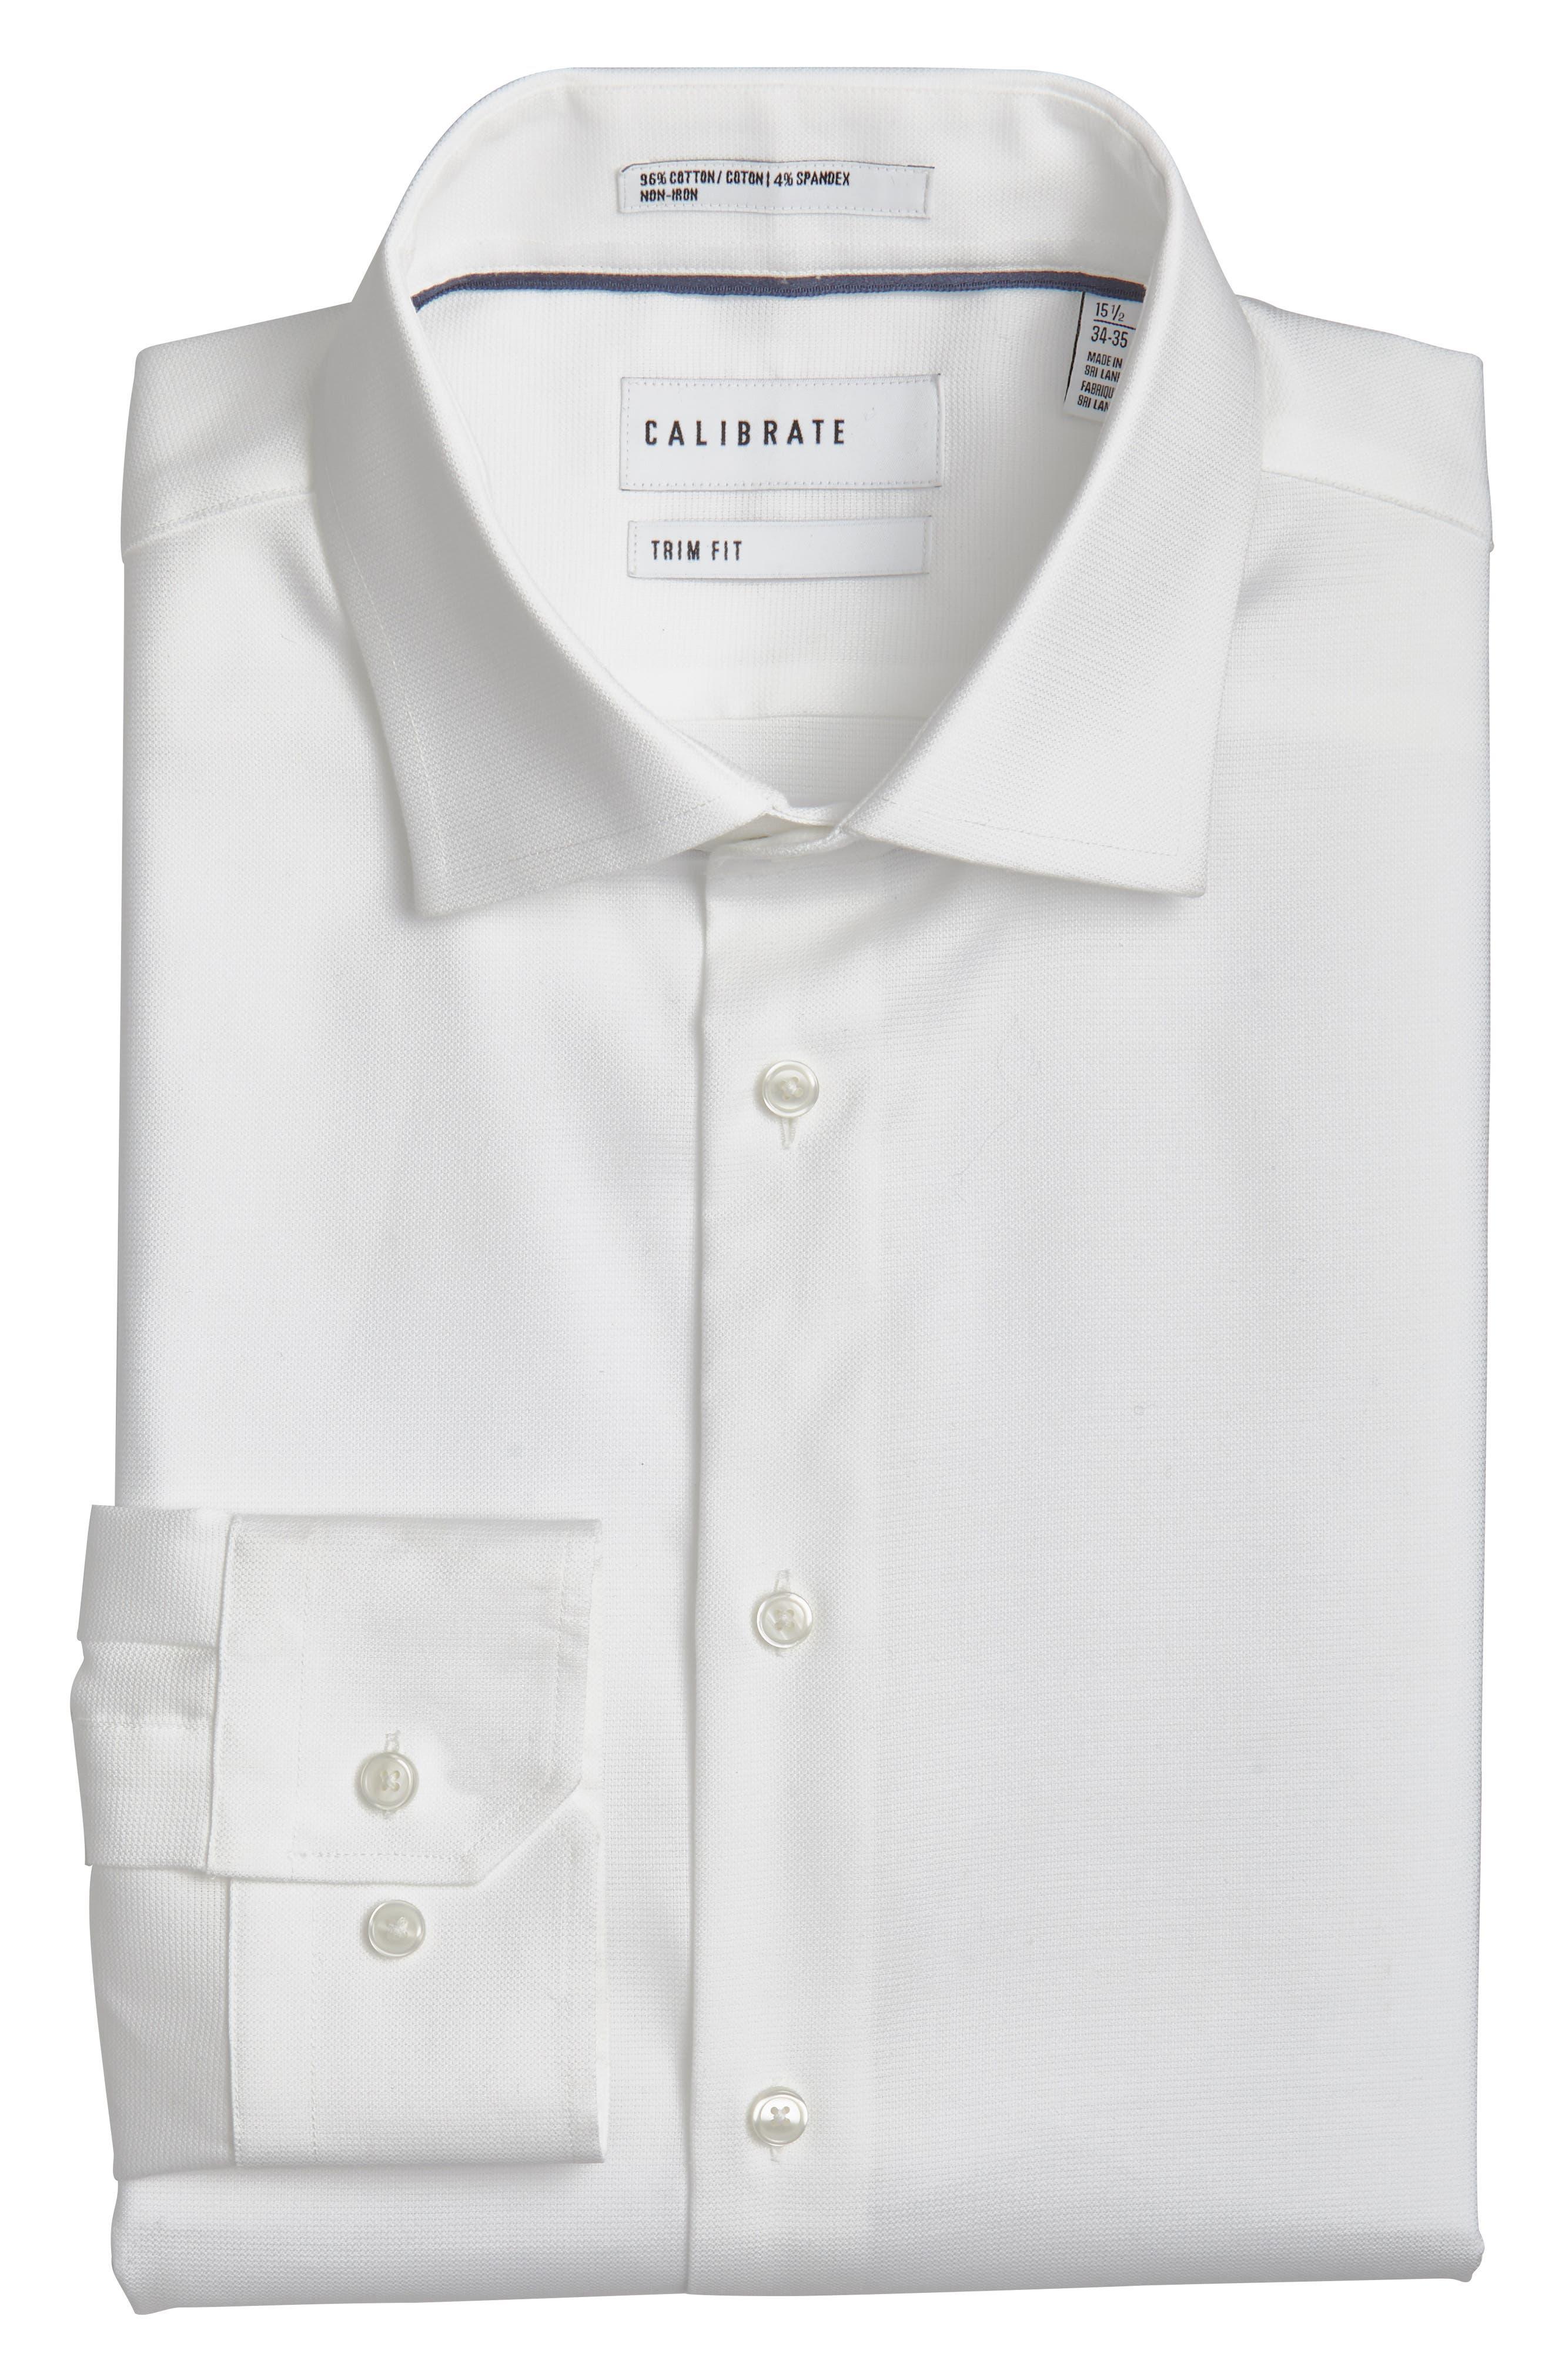 CALIBRATE Trim Fit Non-Iron Dress Shirt